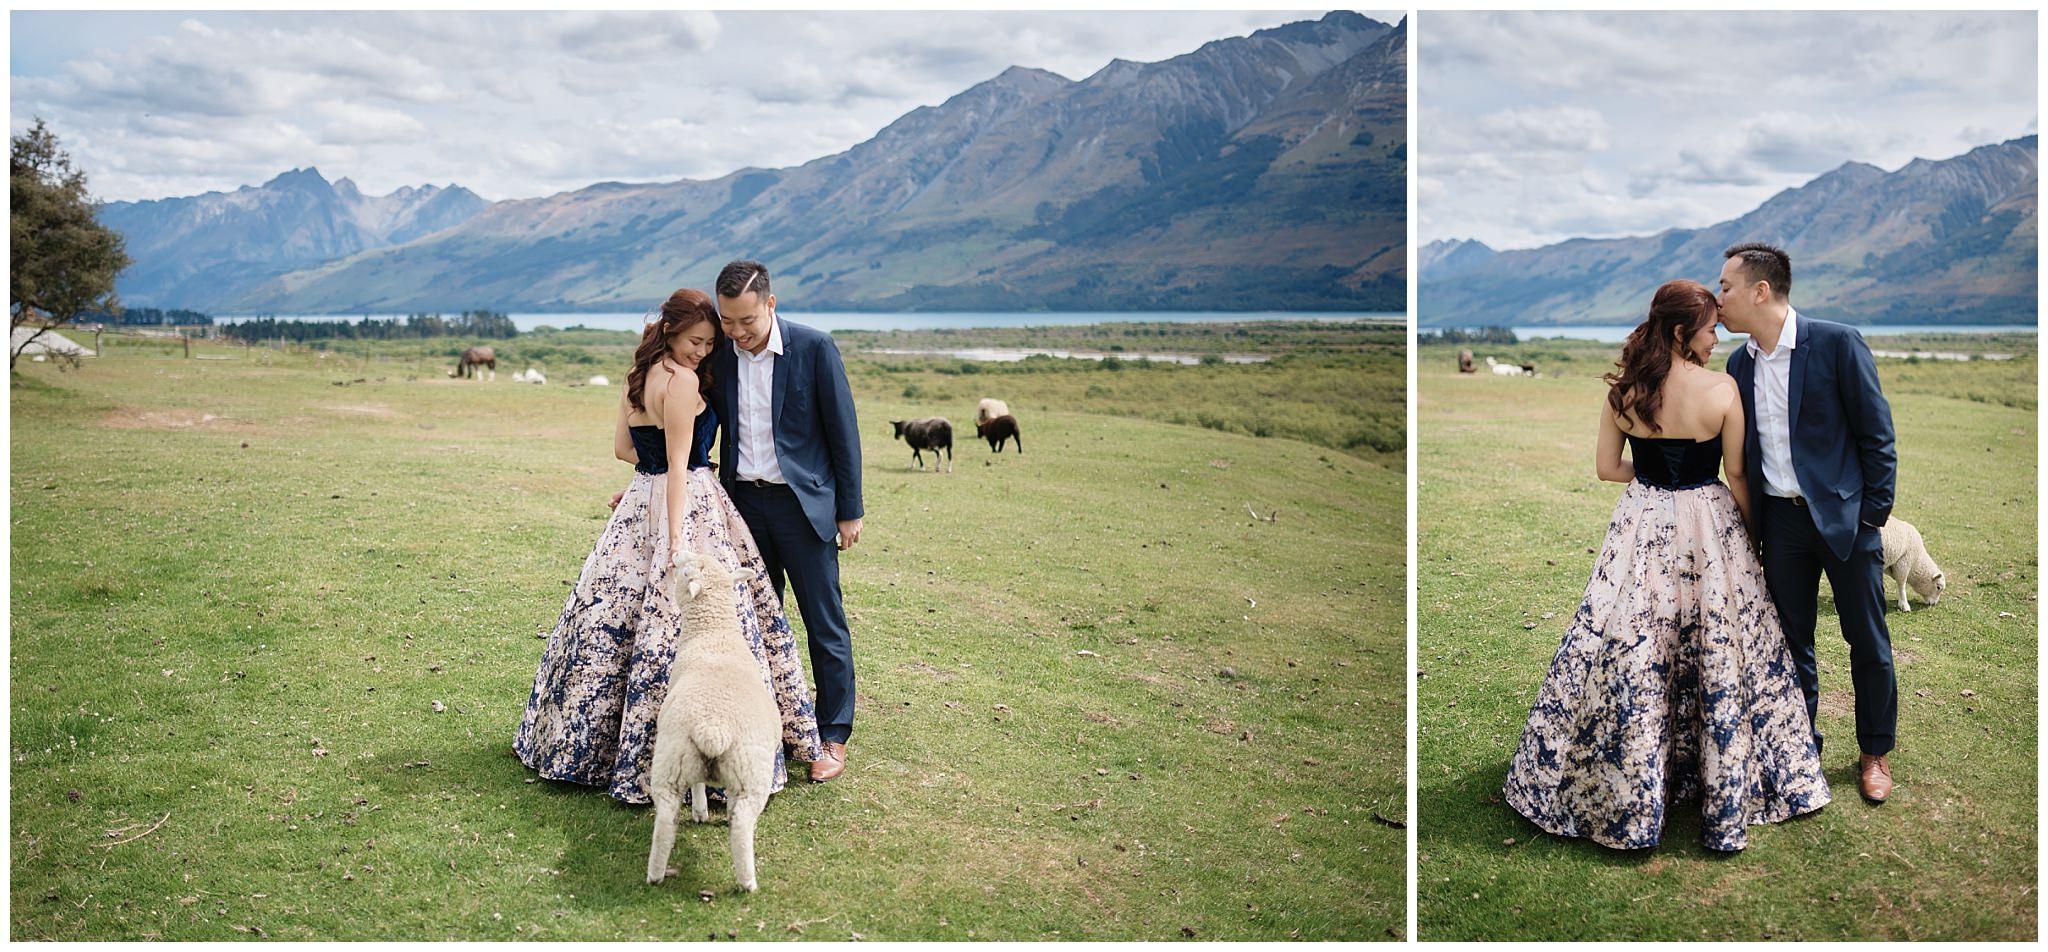 Queenstown New Zealand Prewedding Photographer_0054.jpg